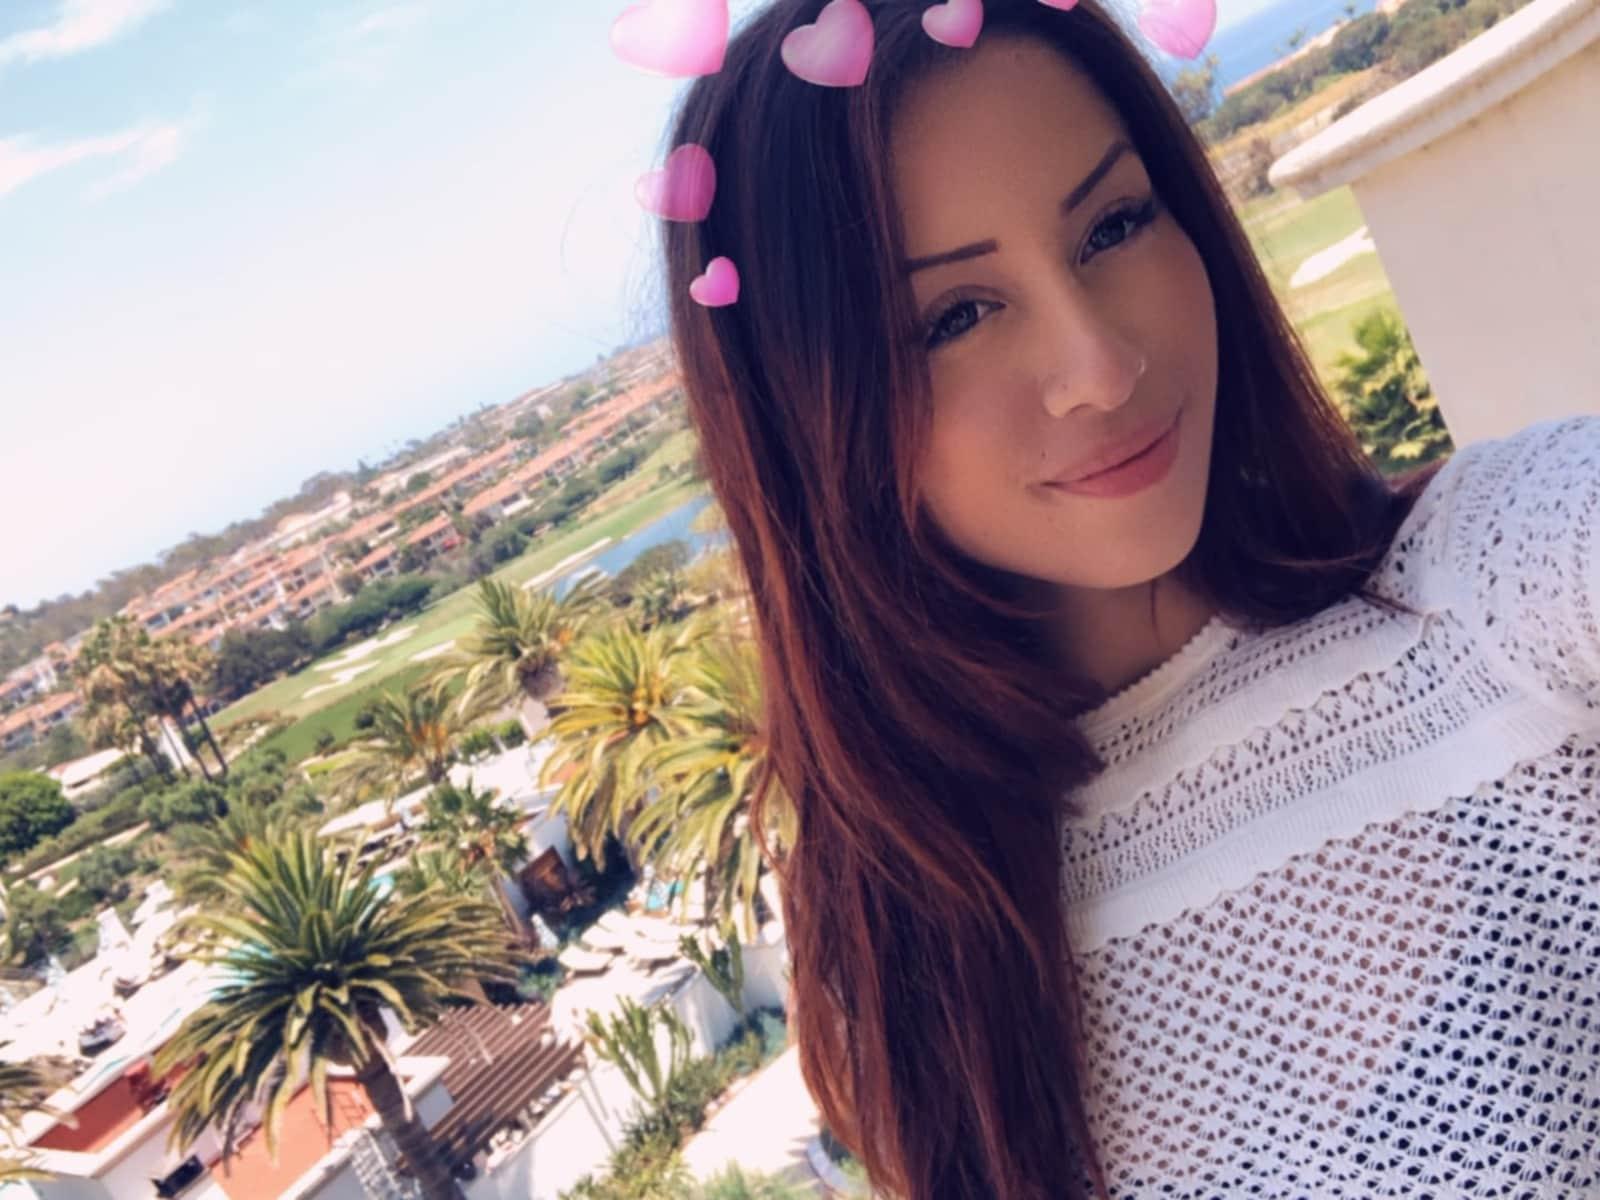 Brandi from Beverly Hills, California, United States